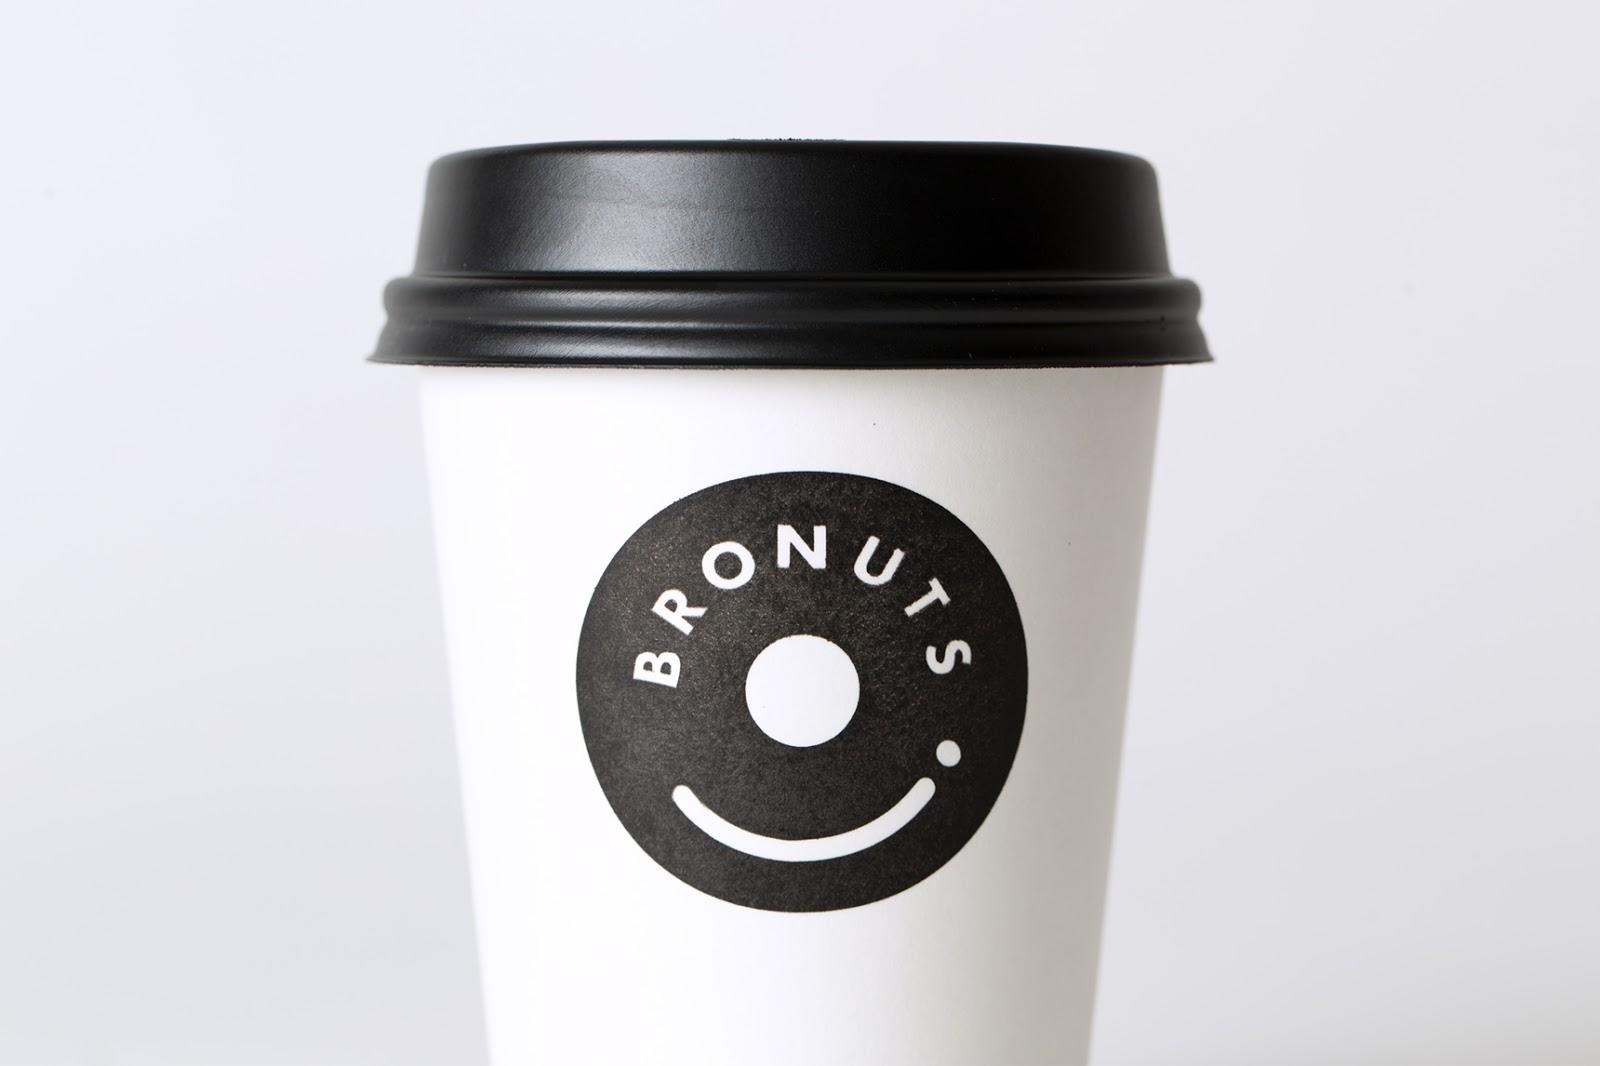 Bronuts-donuts-1